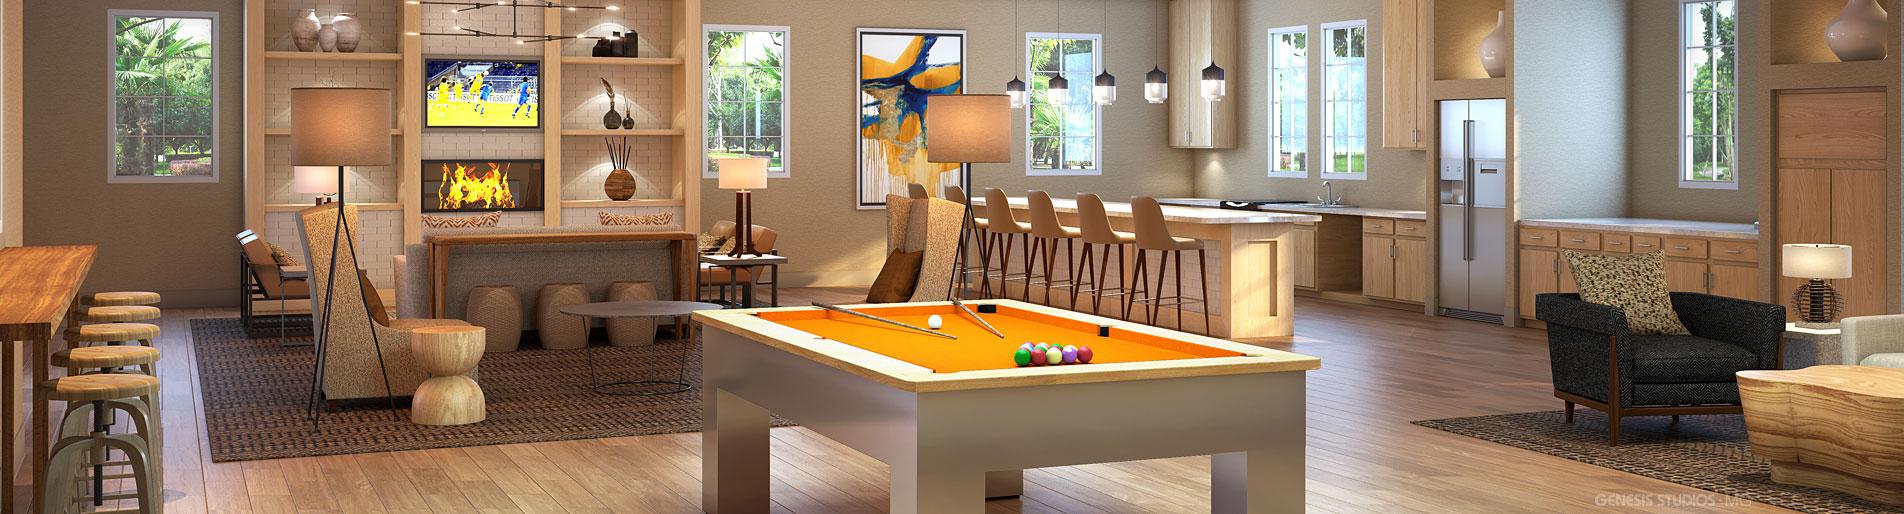 717034 Digital Photorealistic Architectural Renderings of Monterrey Village II Clubroom for MSA Interiors